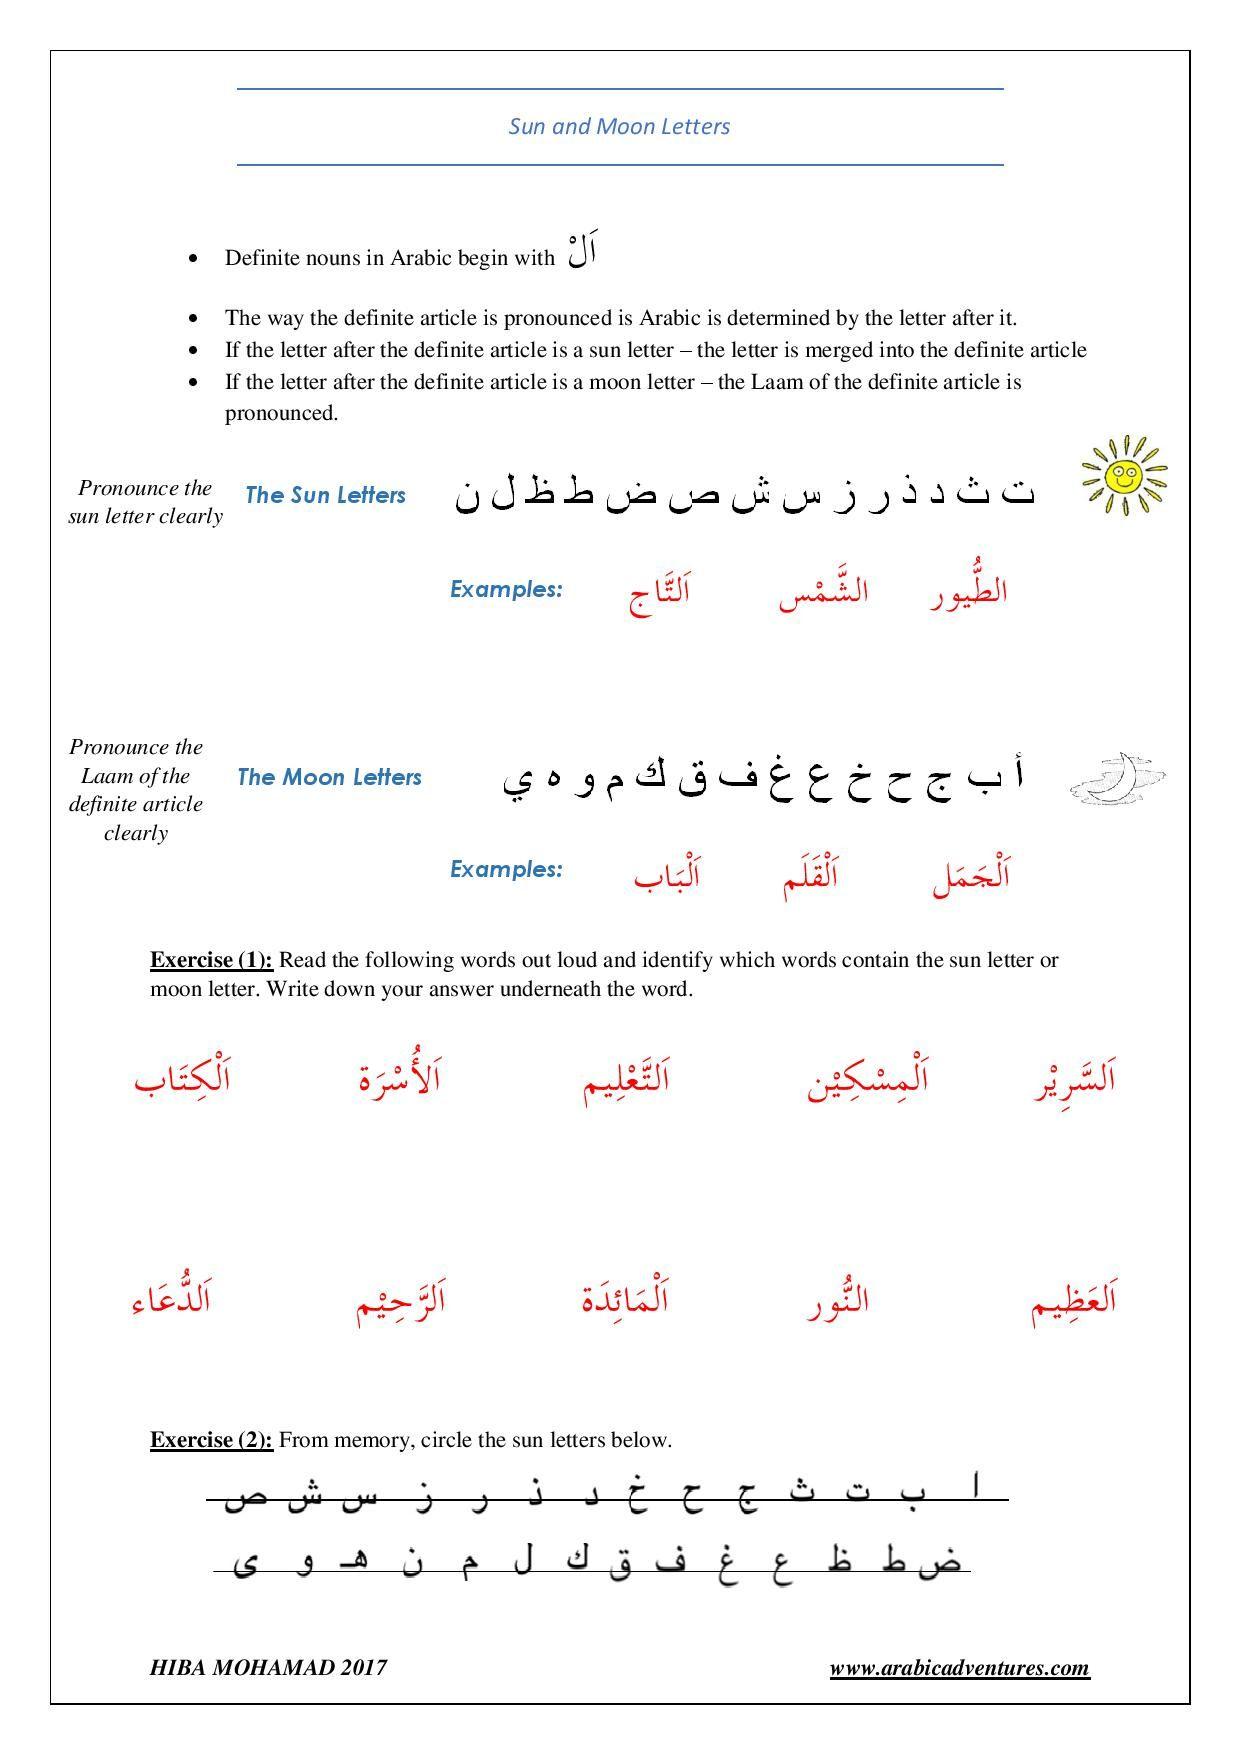 small resolution of Learning Arabic MSA (#FabienneM) Sun and Moon letters in Arabic worksheet  www.arabicadventures.com   Learning arabic